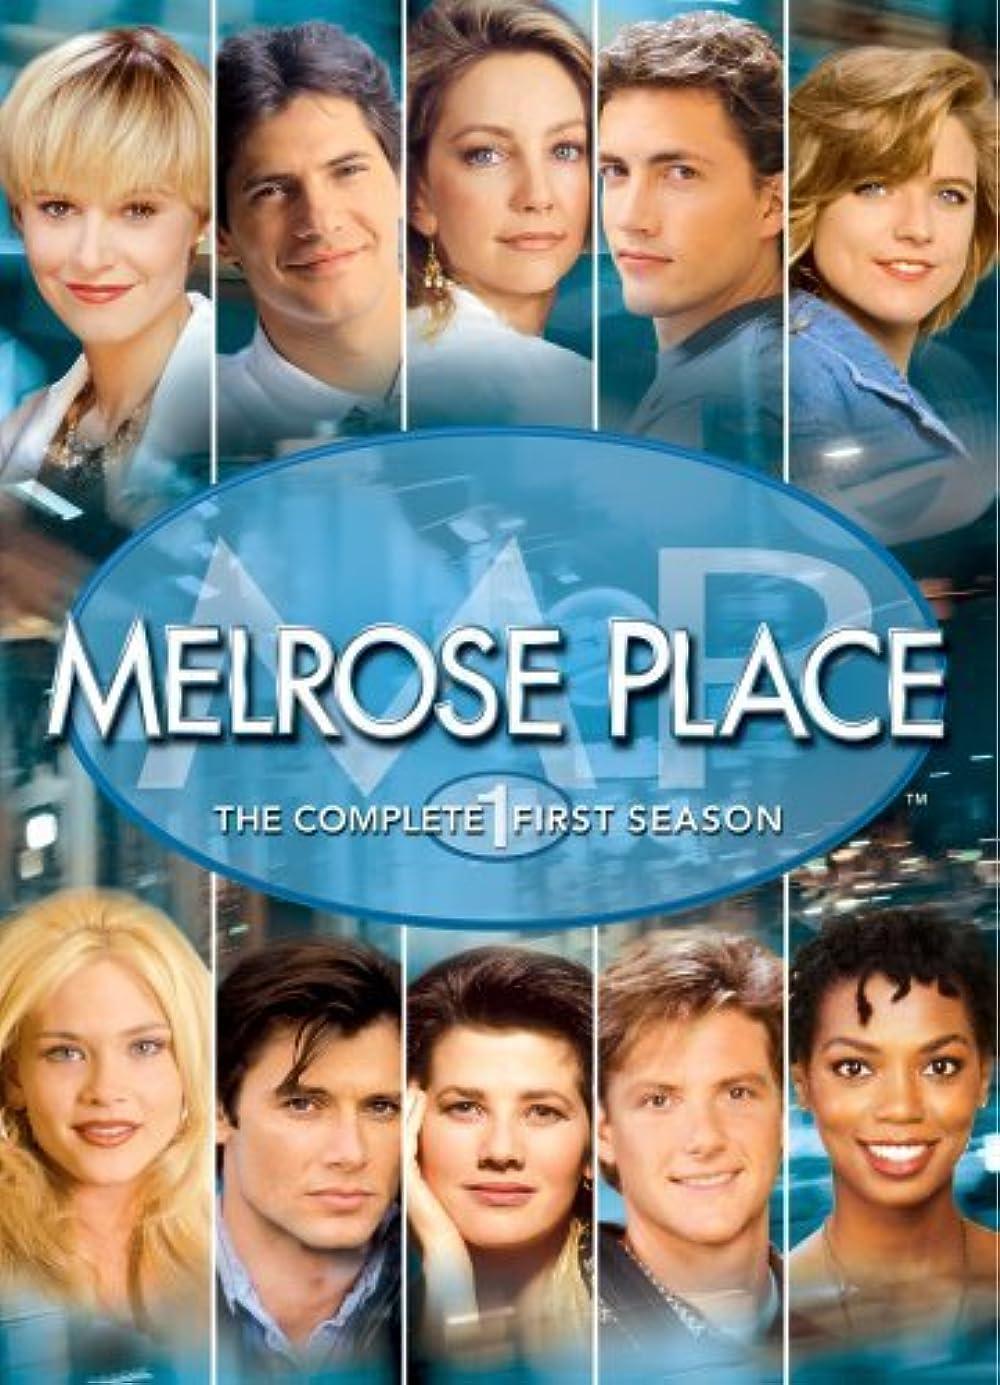 Melrose Place (TV Series 1992–1999) - IMDb